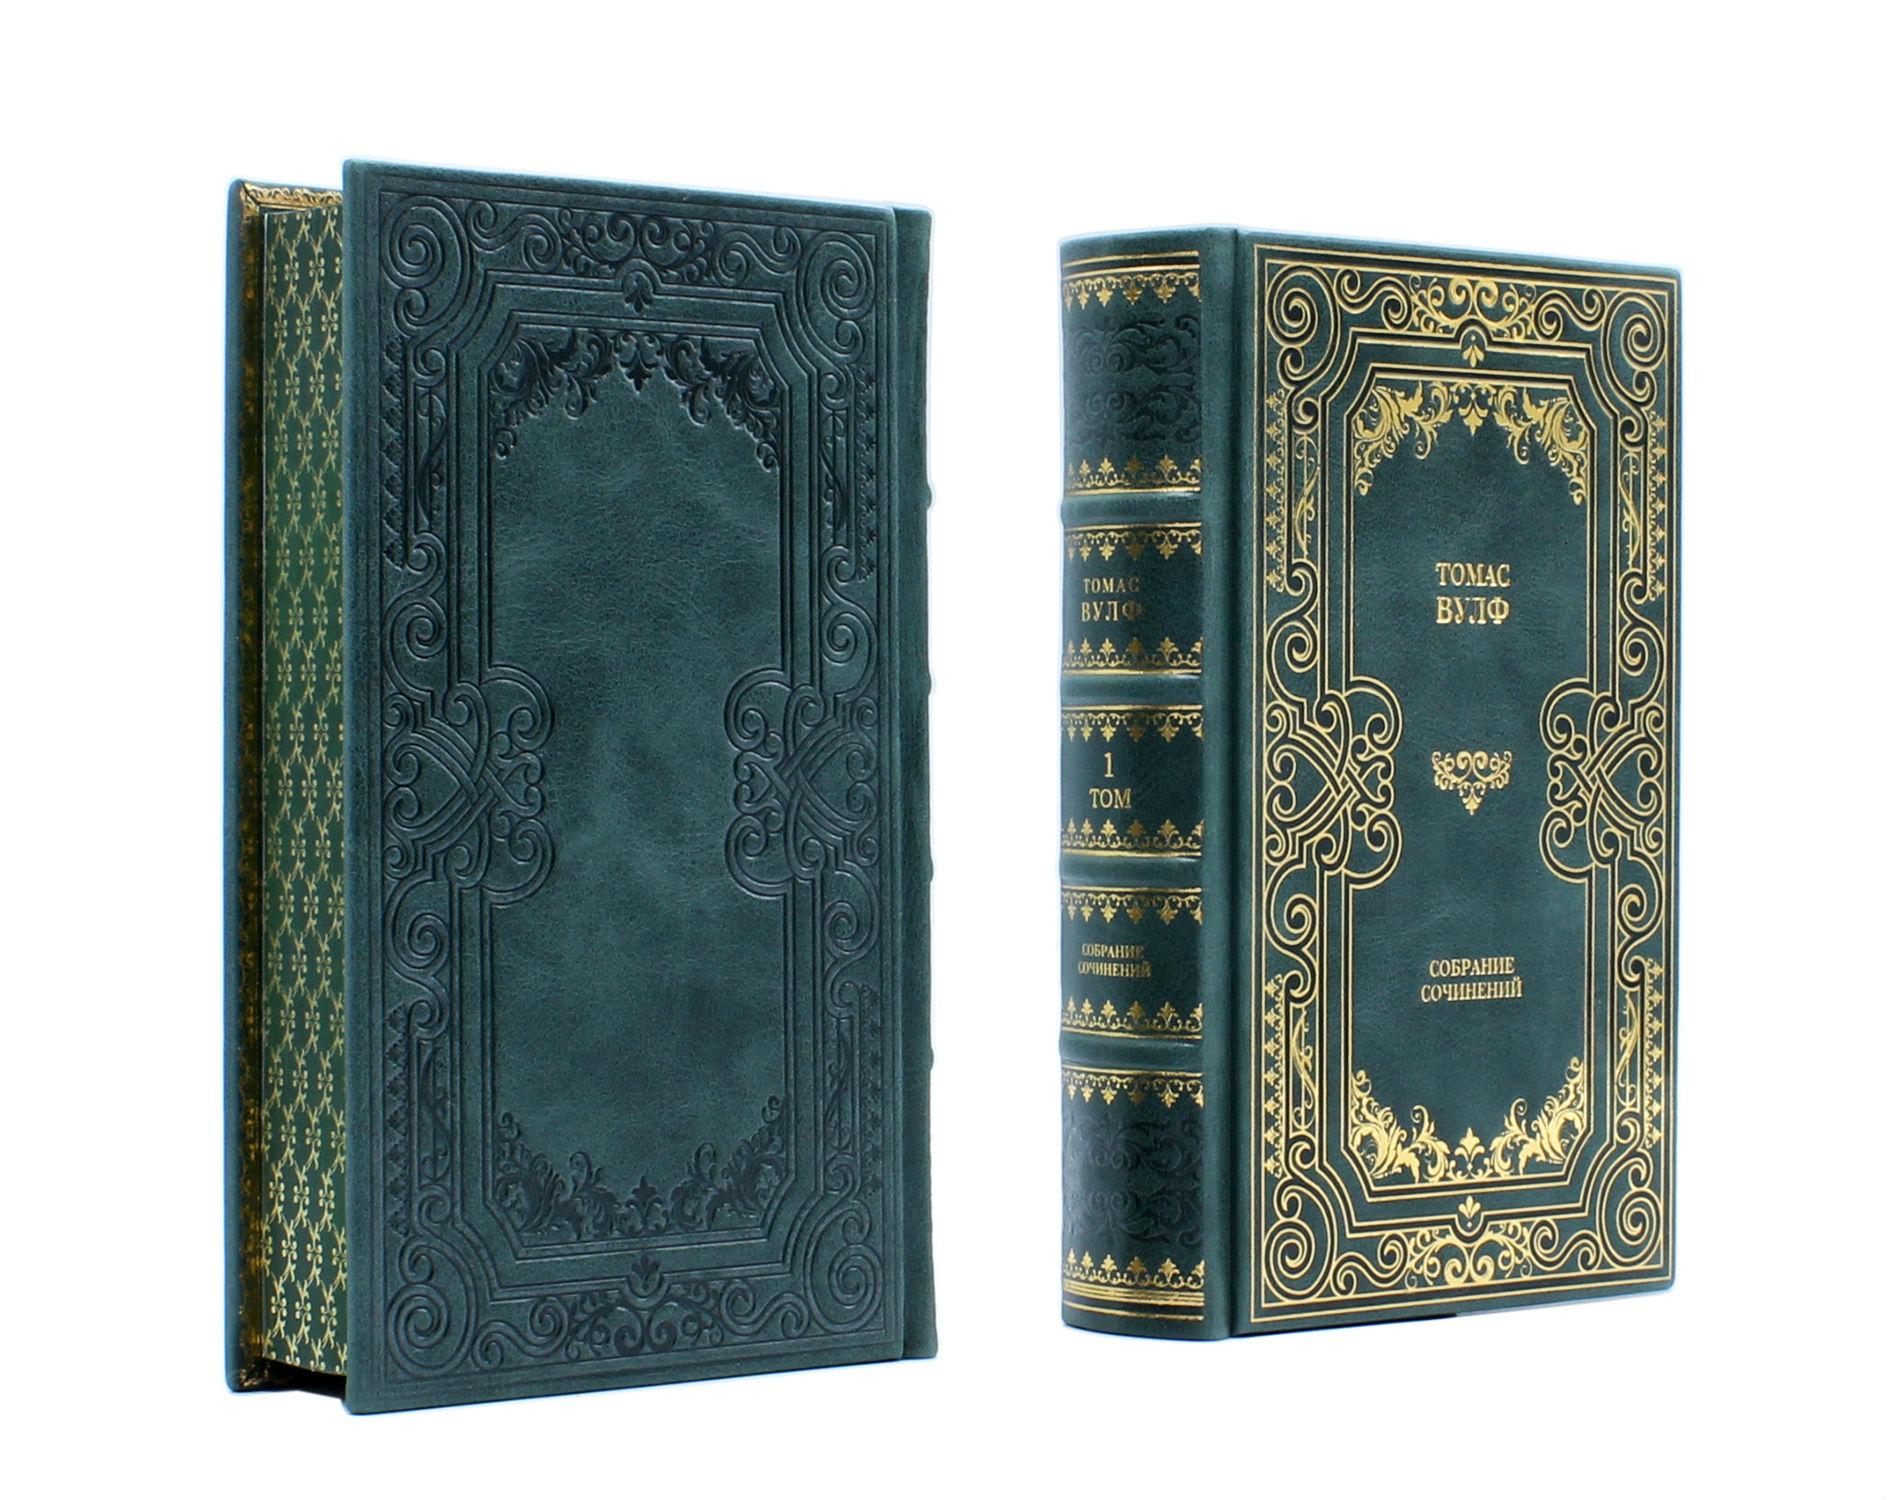 Томас Вулф собрание сочинений вид книг